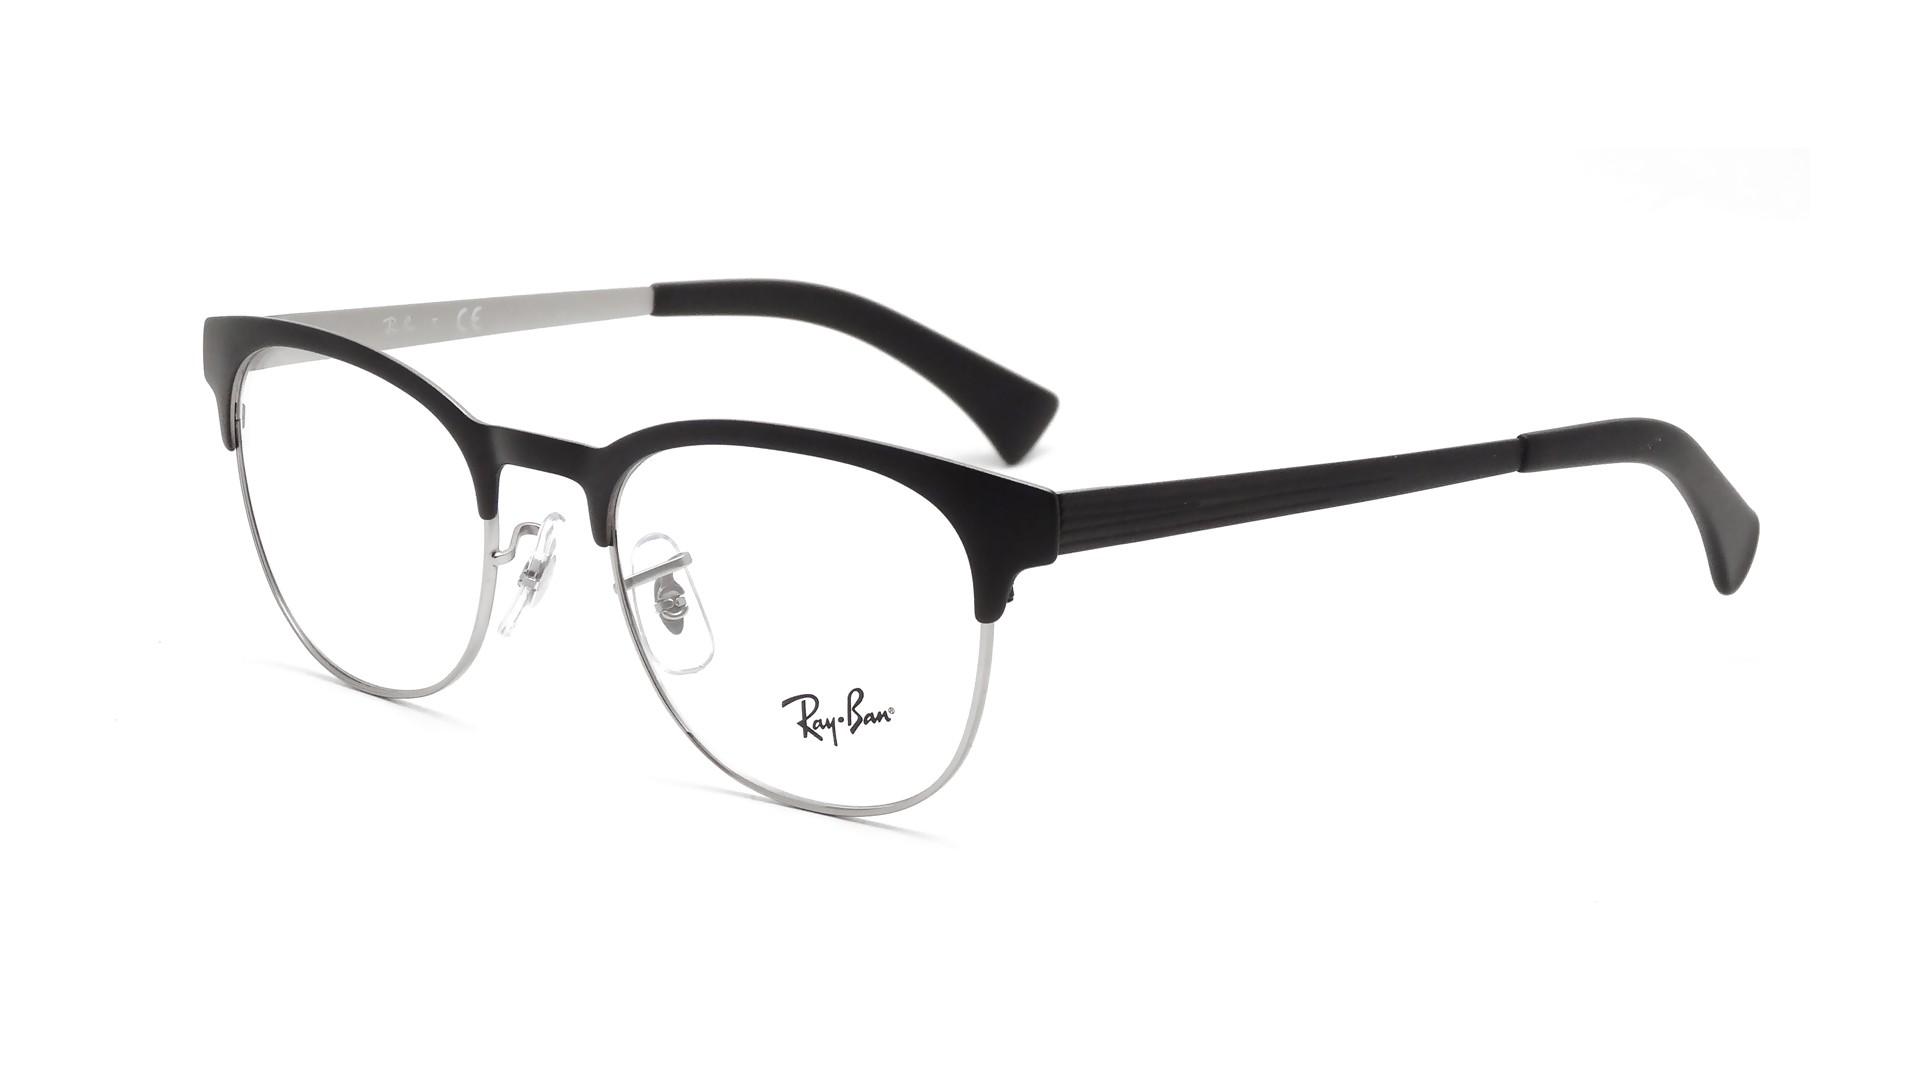 clubmaster ray ban eyeglasses  Ban Clubmaster Black RX6317 RB6317 2832 49-20